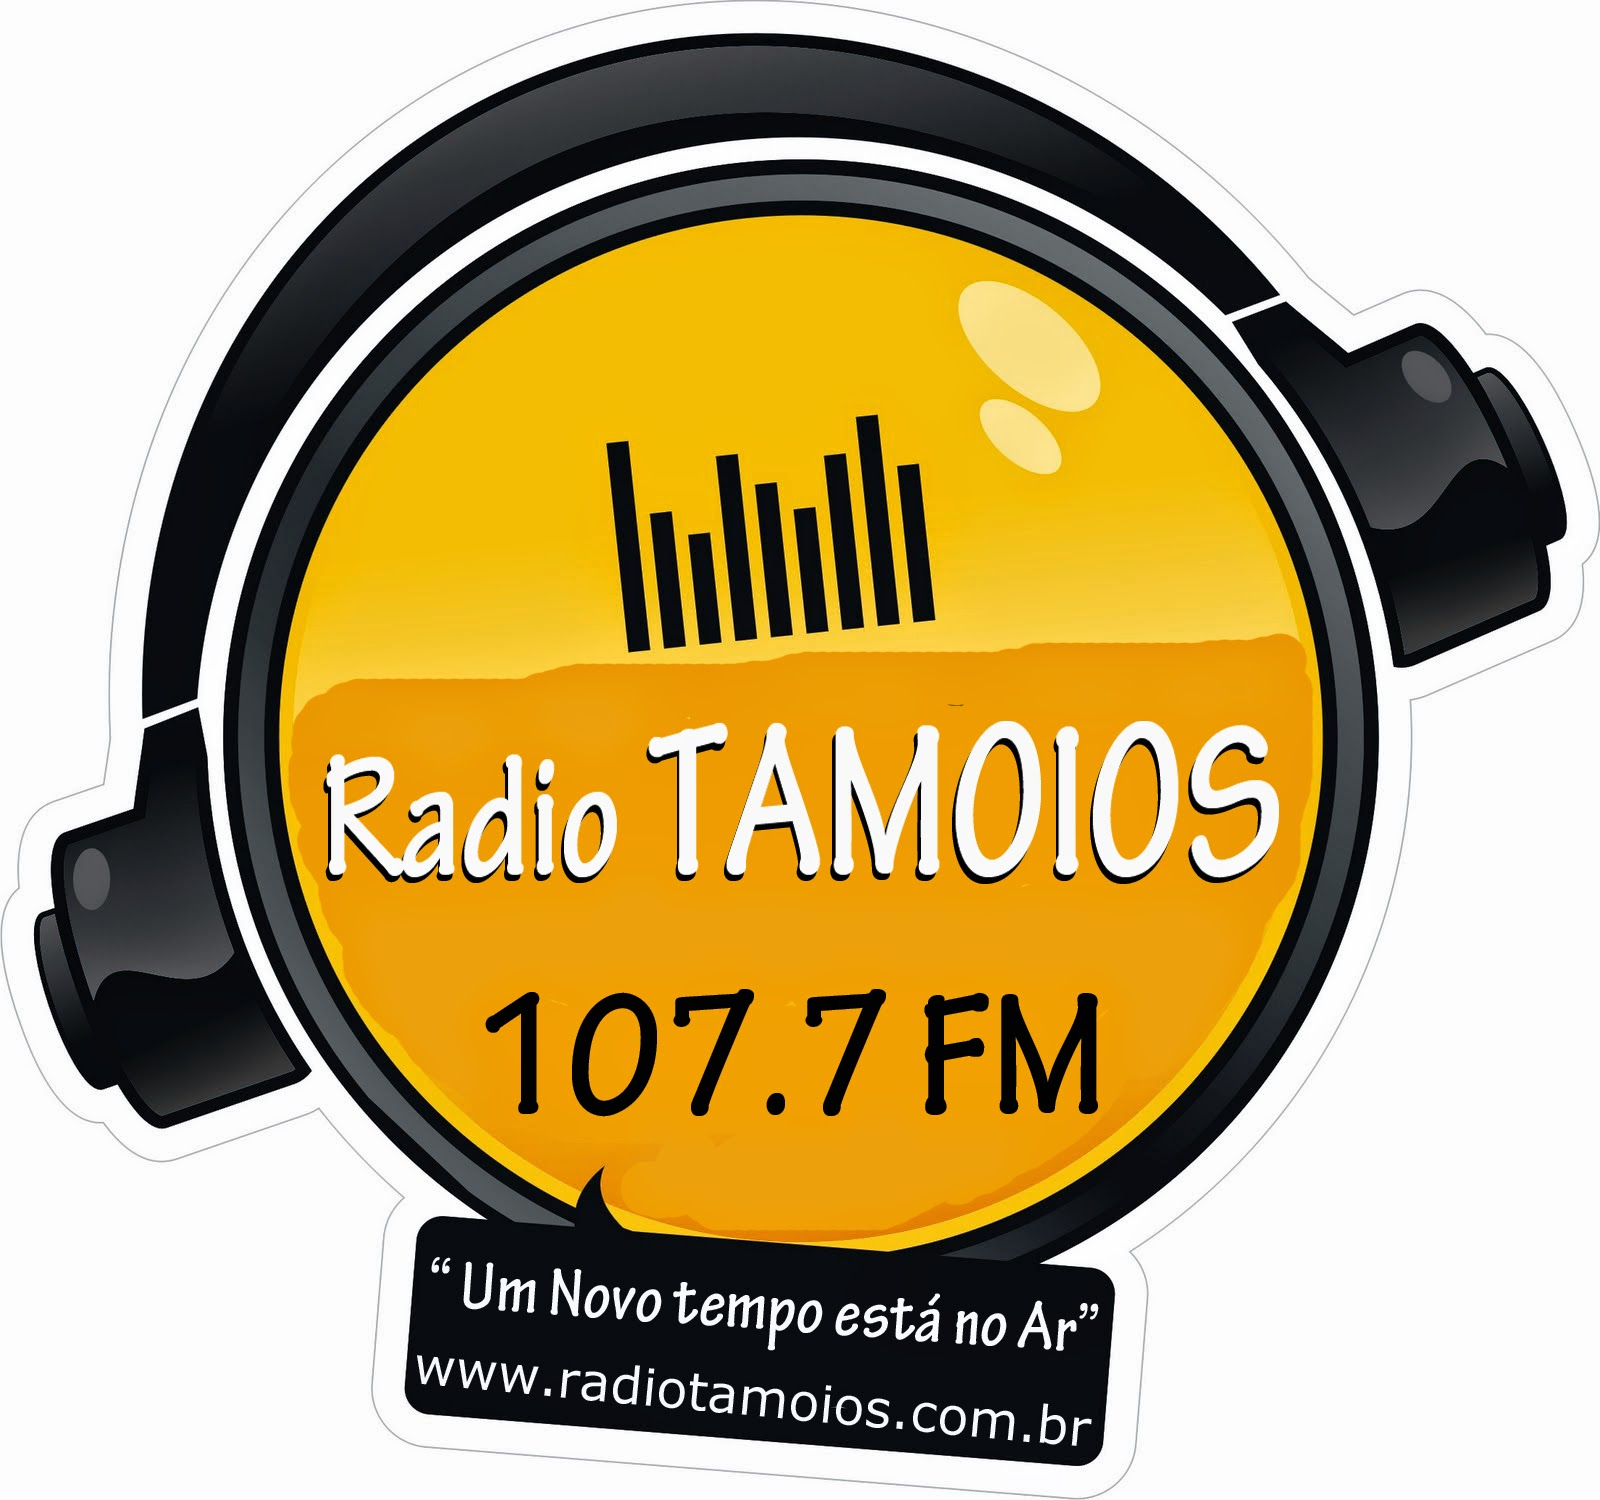 RADIO TAMOIOS